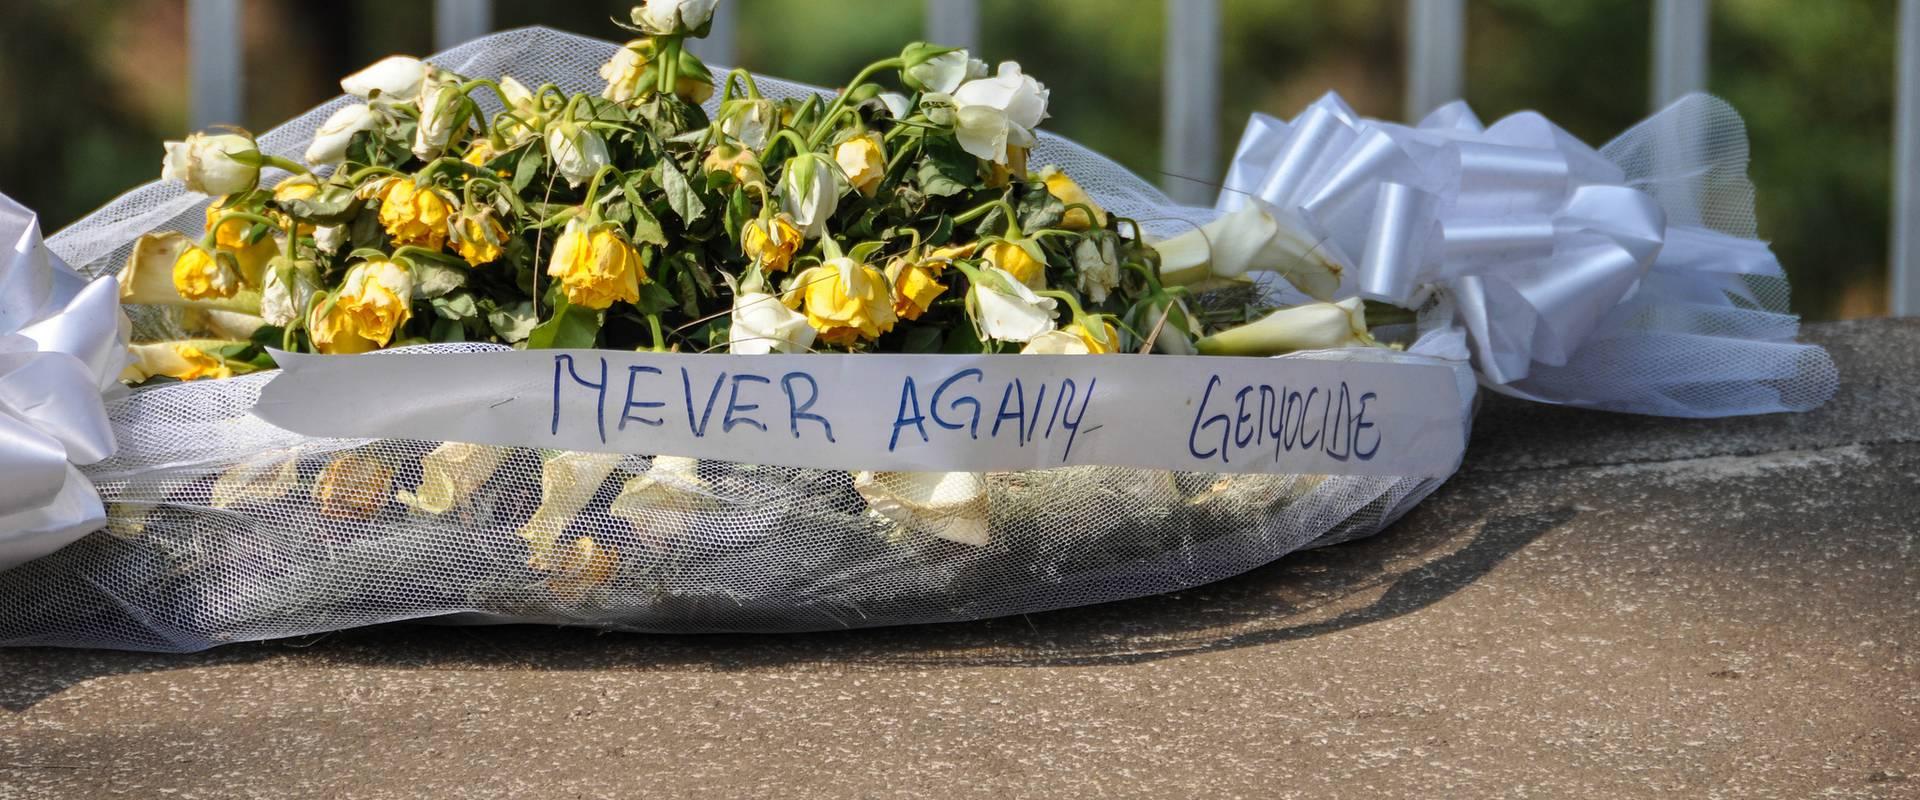 atrocity prevention peace insight